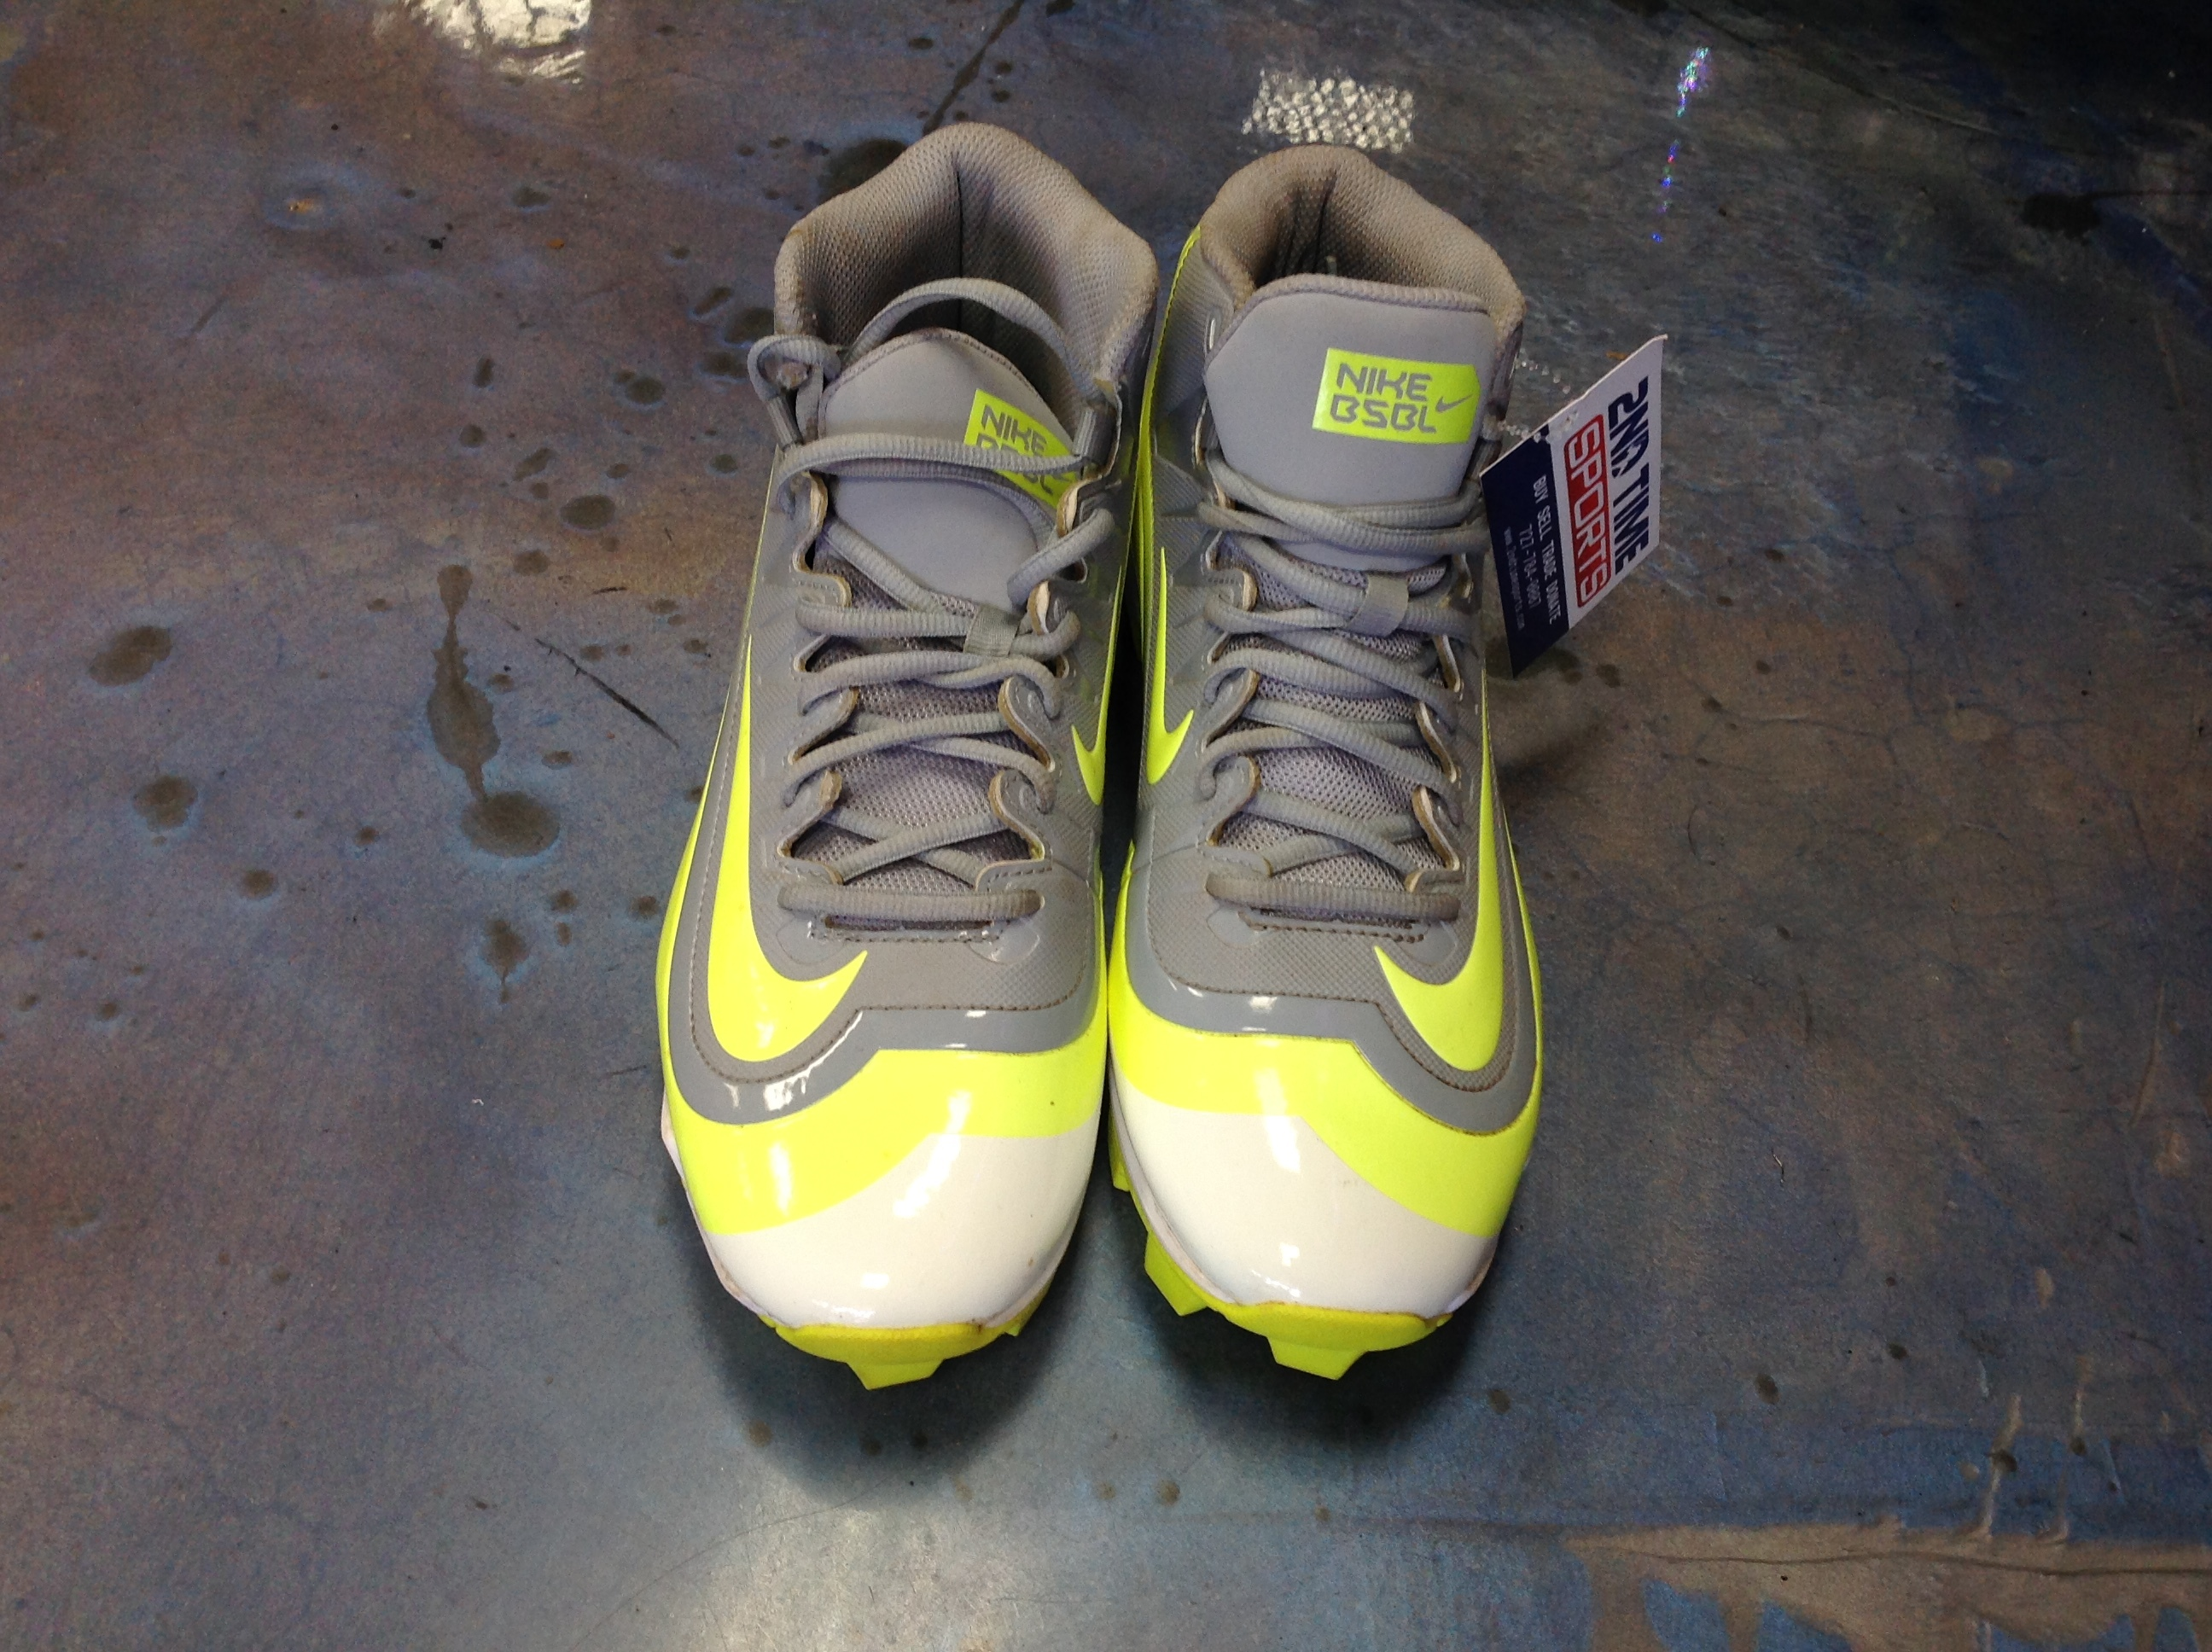 NIKE - HUARACHE - FOOTBALL CLEATS FOOTBALL MENS SIZE 8